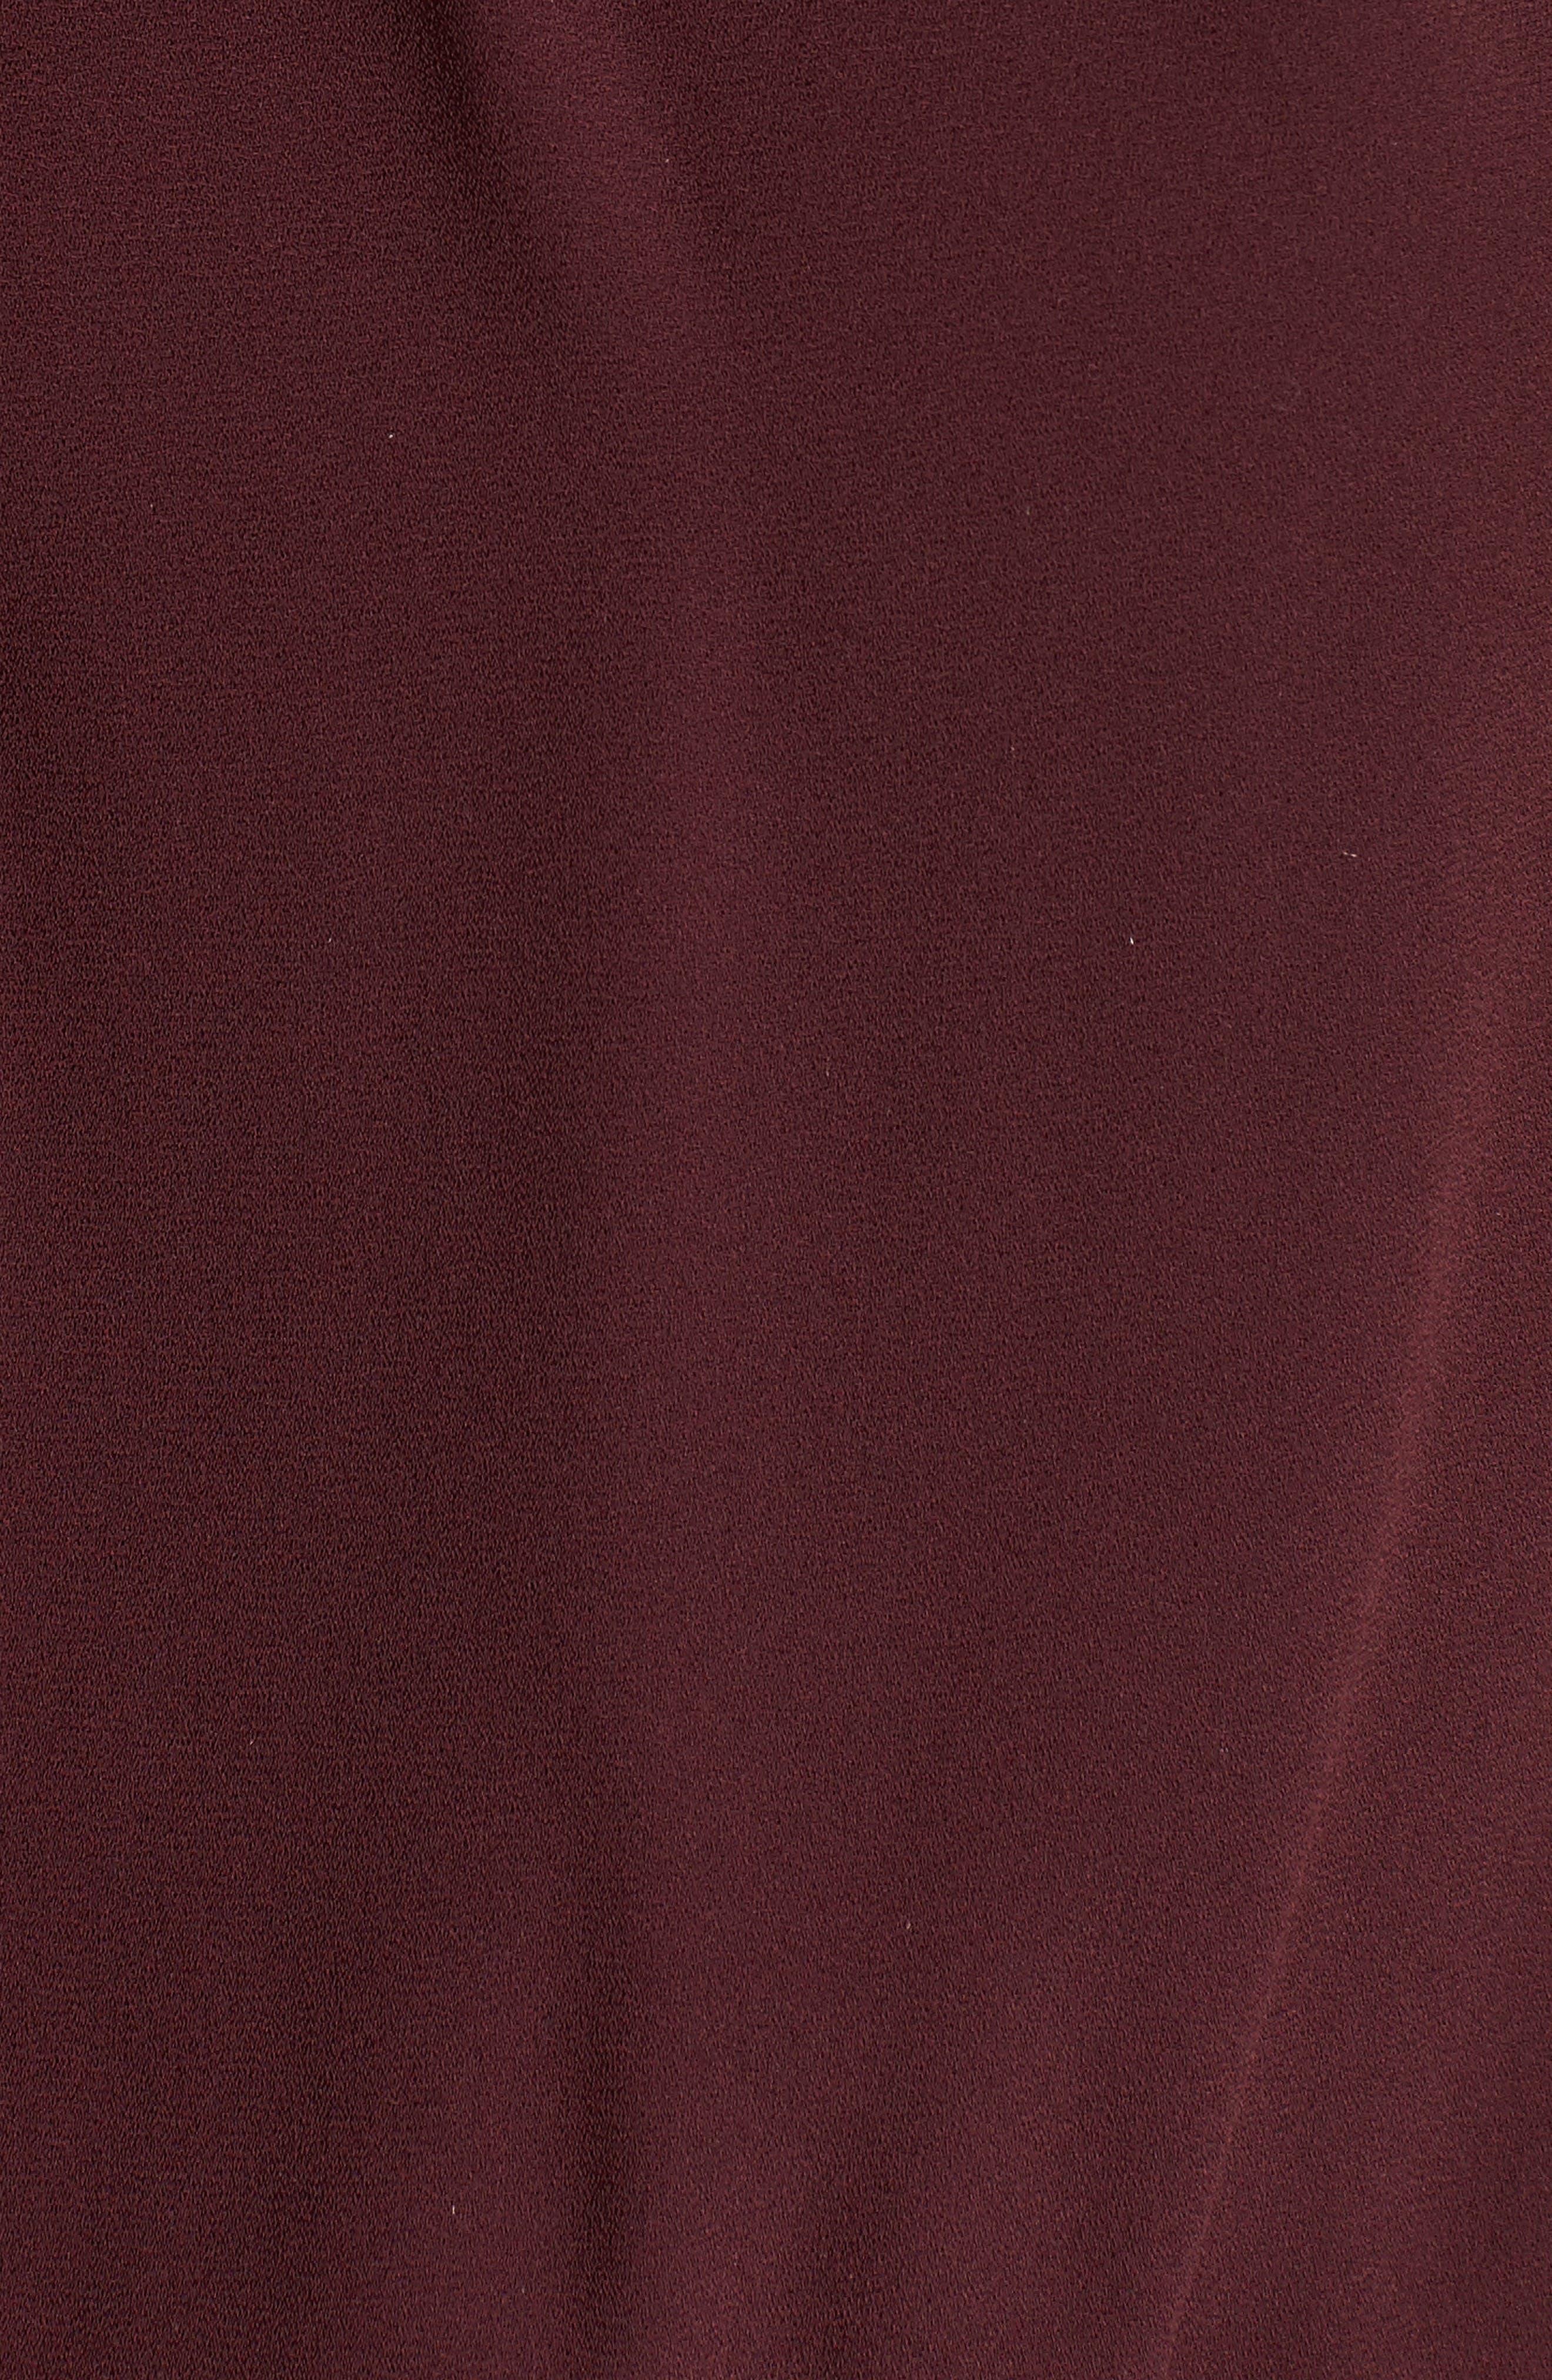 Blouson Chiffon Skater Dress,                             Alternate thumbnail 229, color,